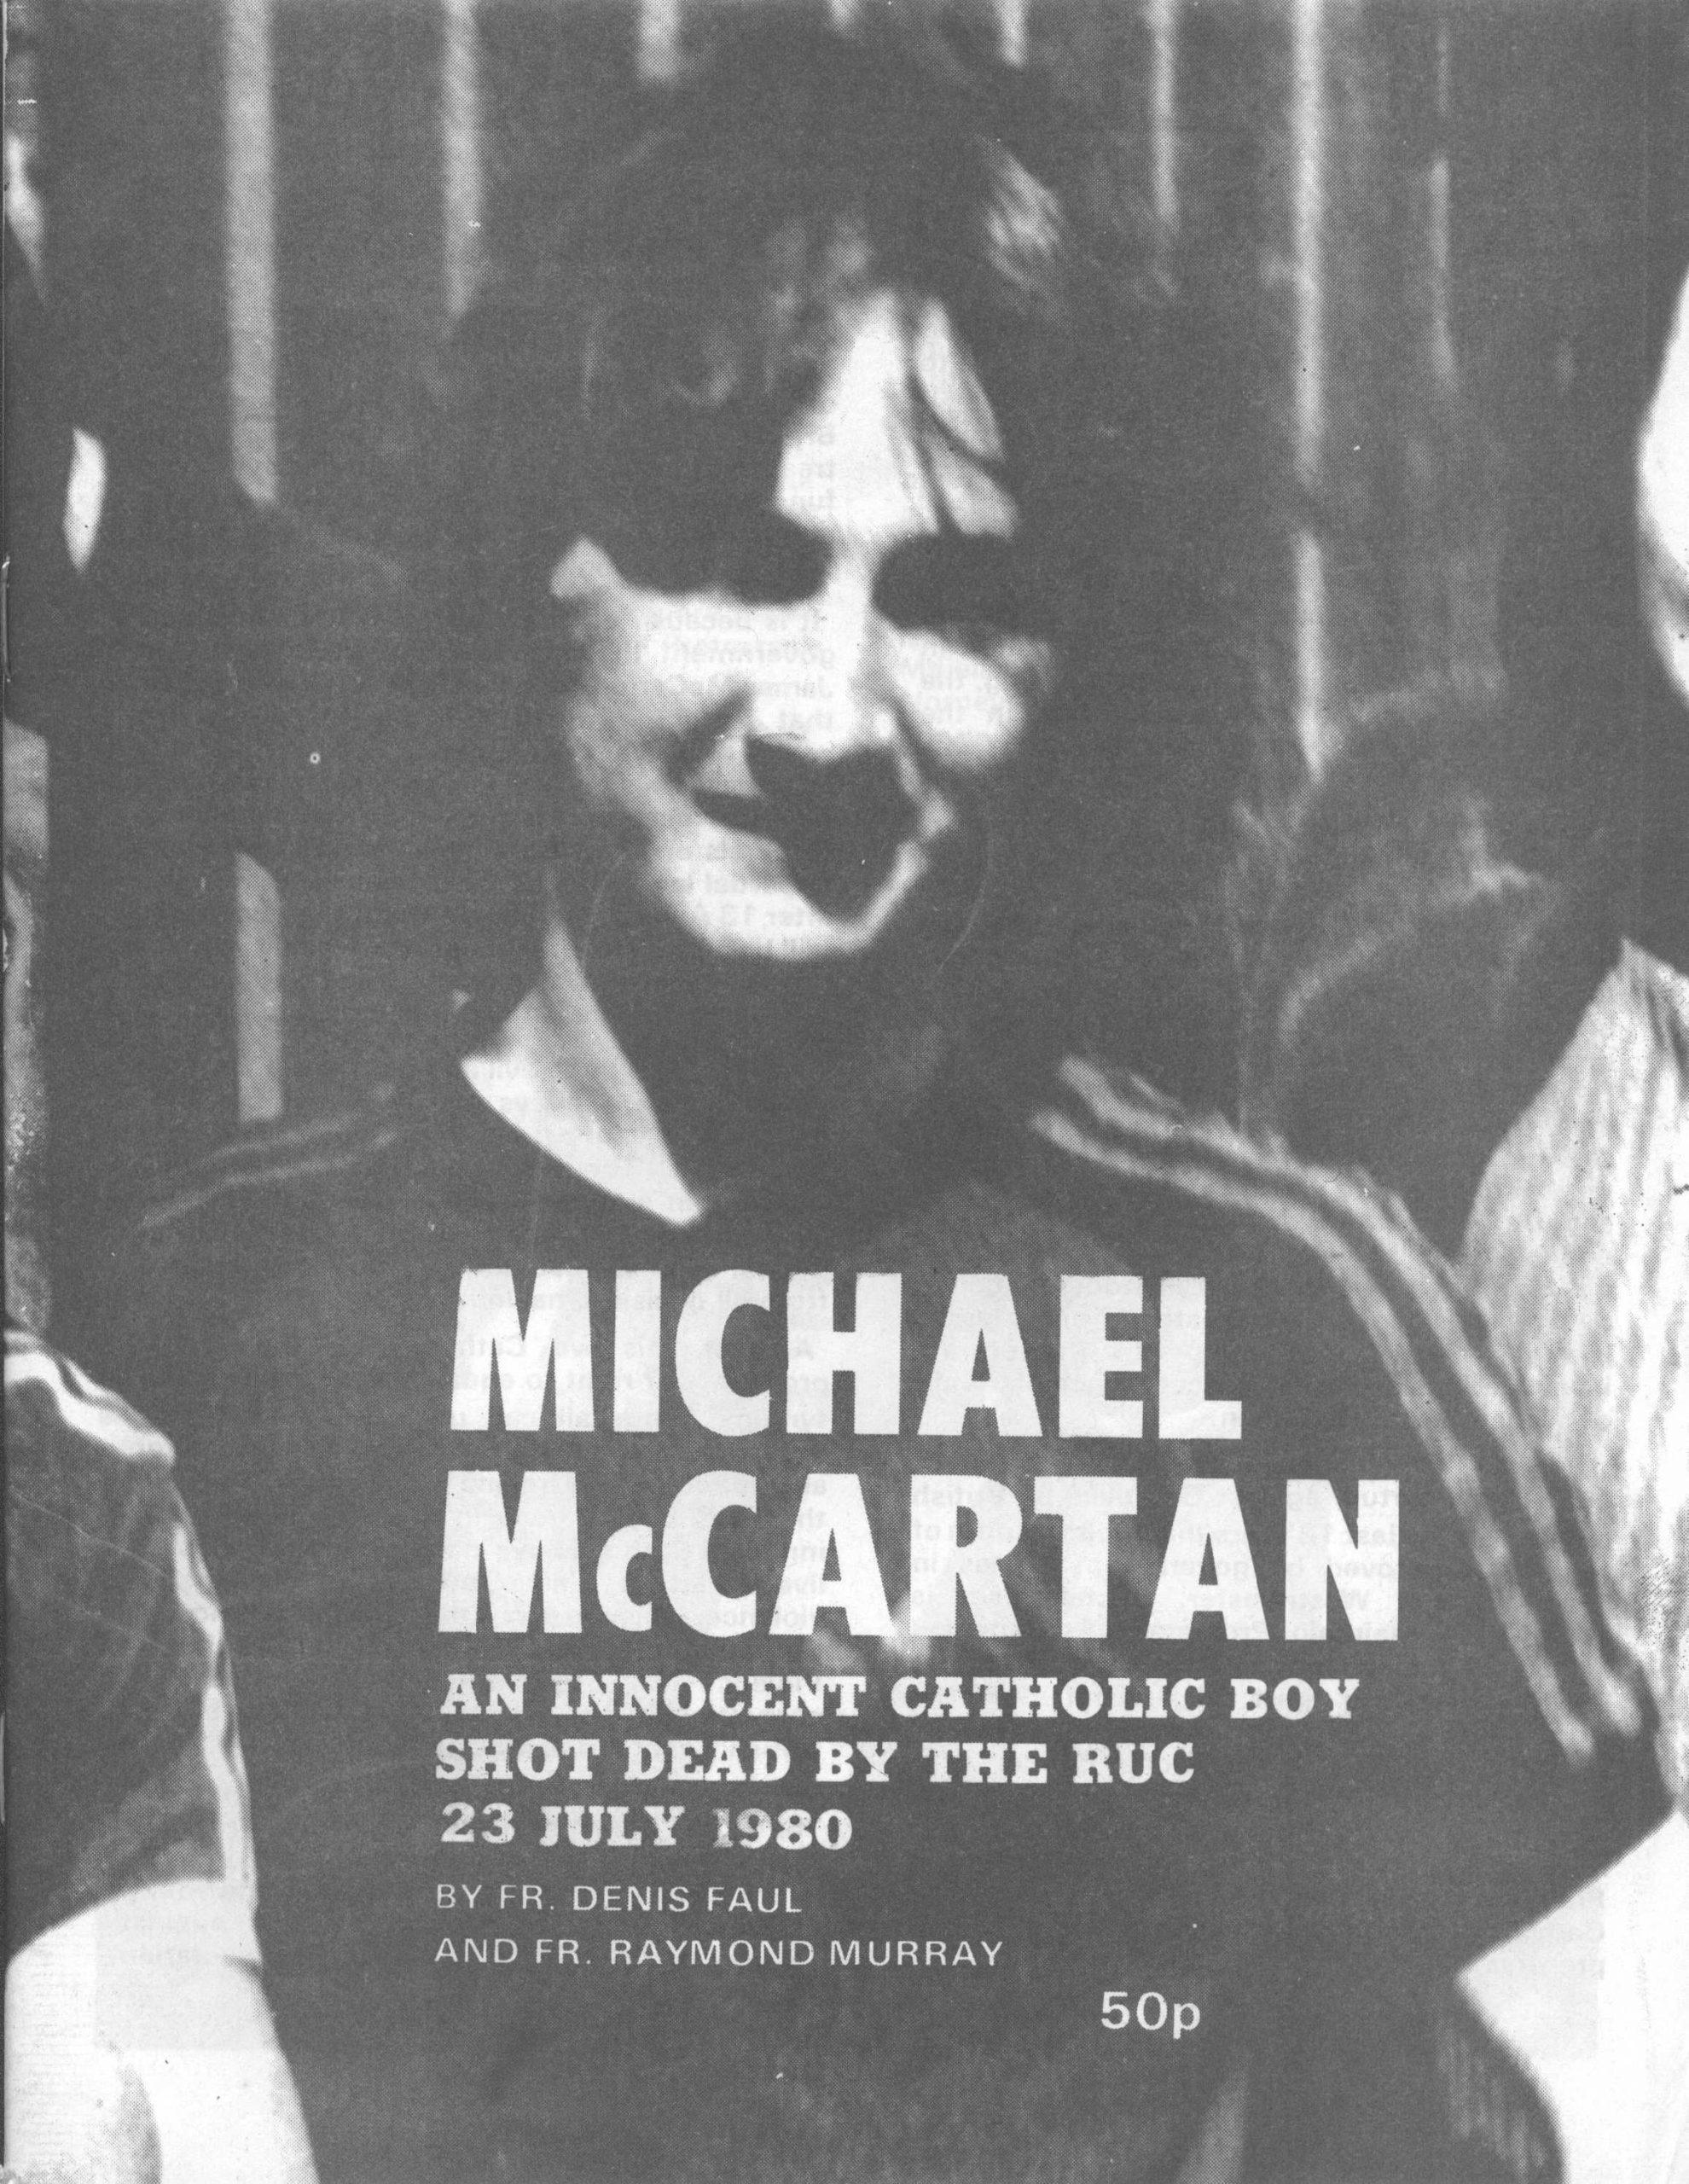 michael mccartan an innocent catholic boy shot dead by the ruc